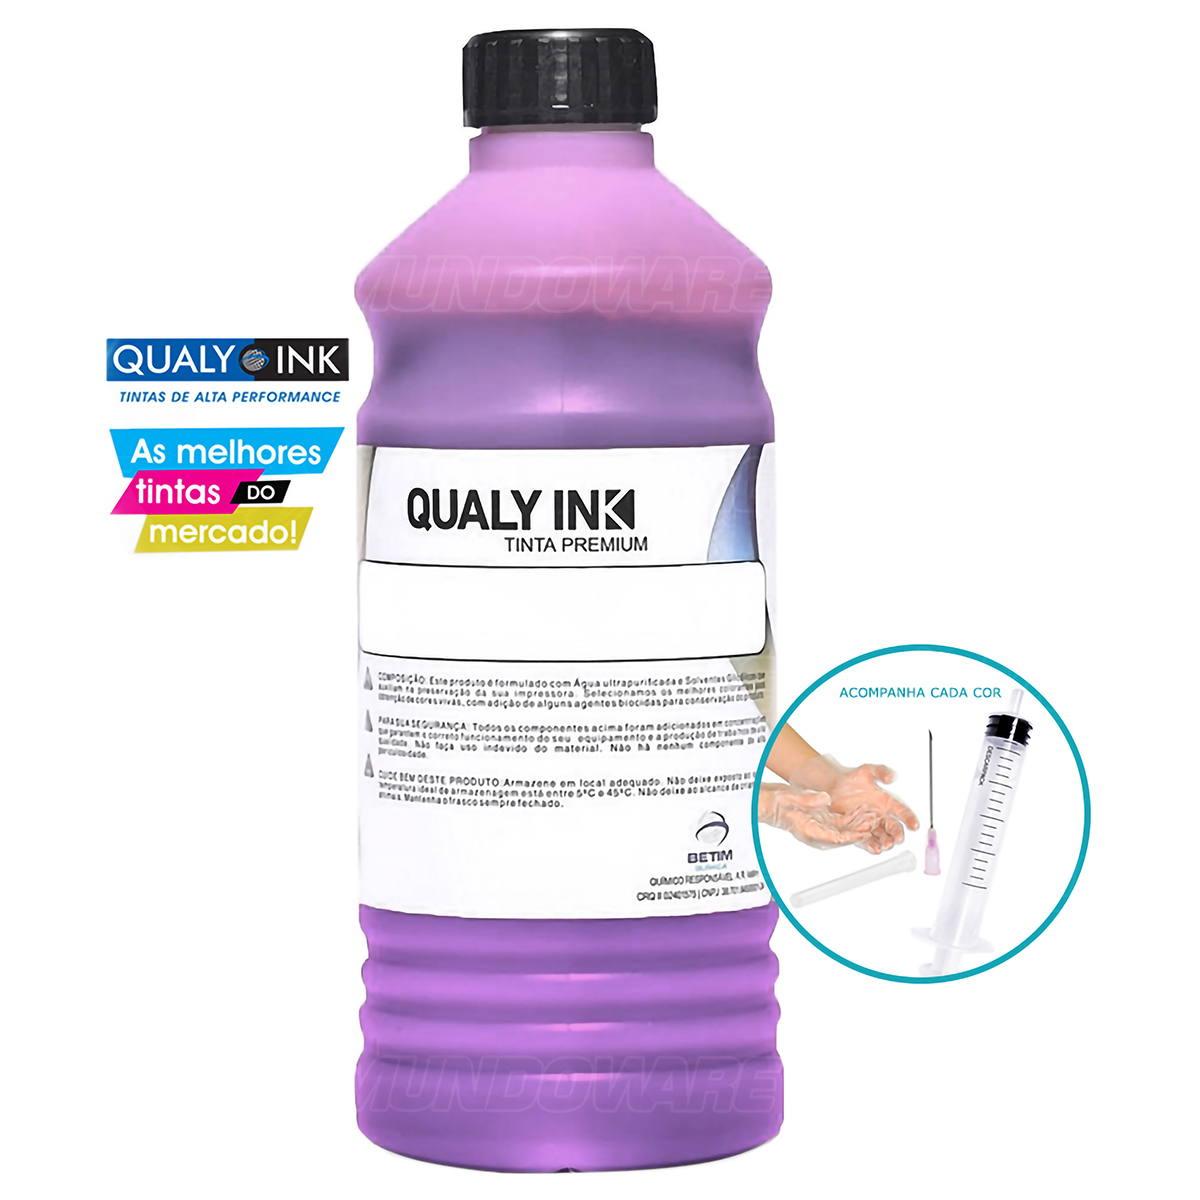 Tinta Corante Qualy-Ink para Impressora Canon G1800 G3800 G1000 G2000 G2100 G2900 G3900 Magenta Refil 1L